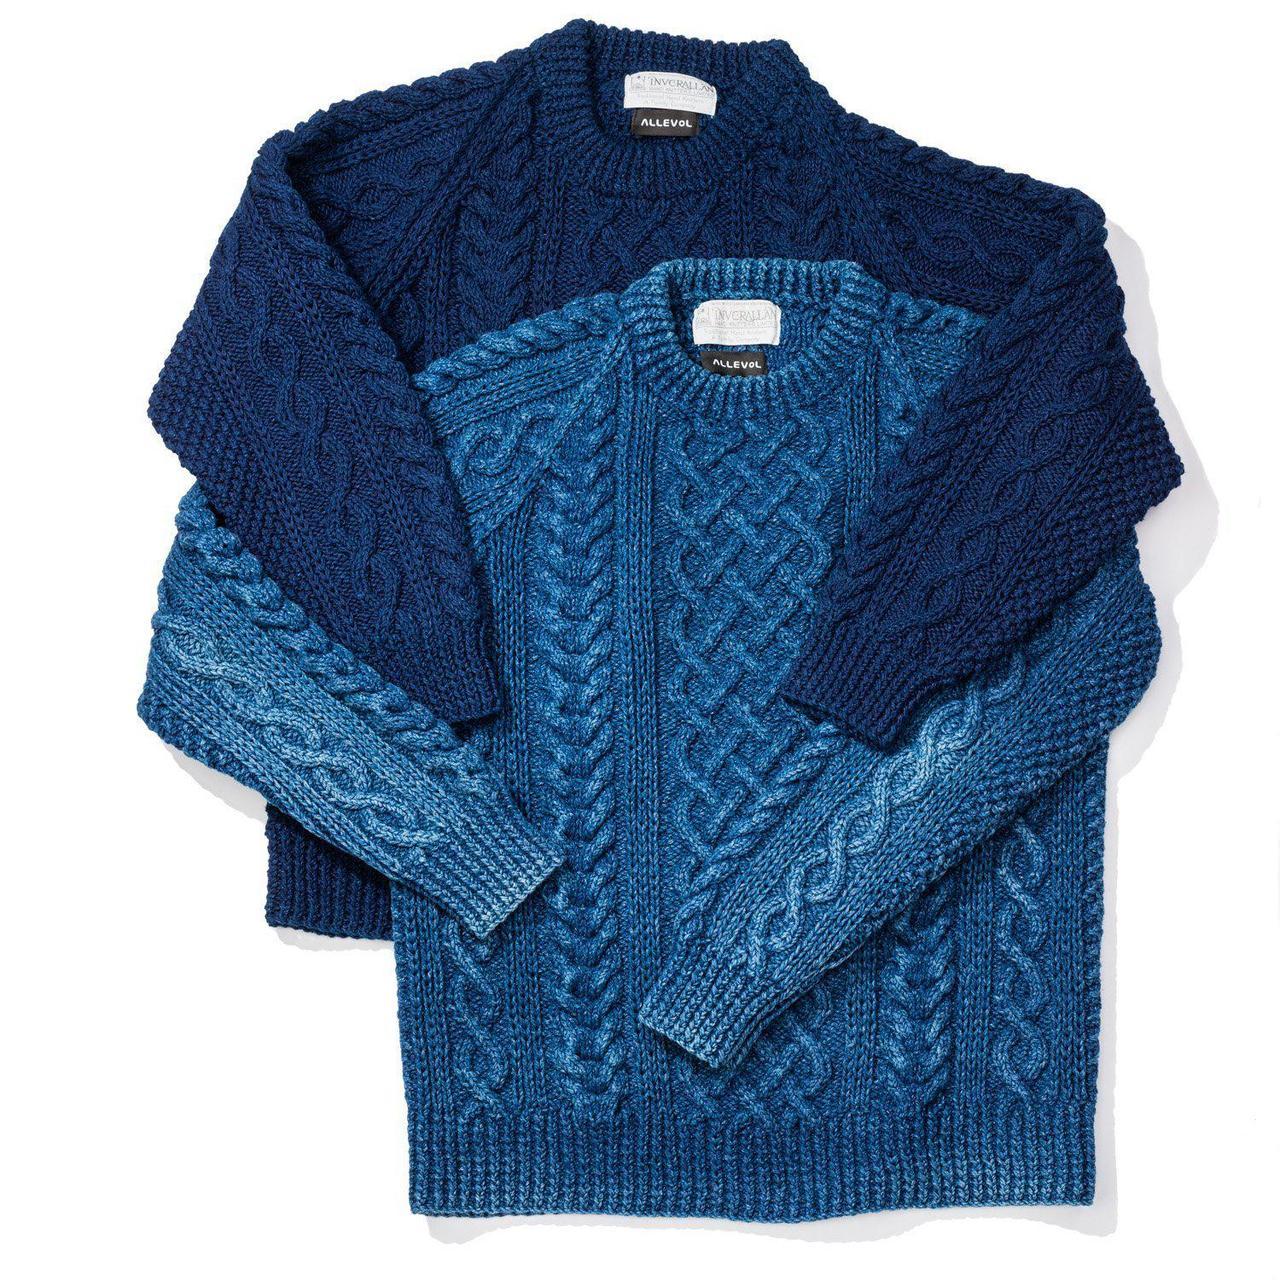 Allevol x Inverallan Cable Knit Crew 1A Indigo-Knitwear-Clutch Cafe